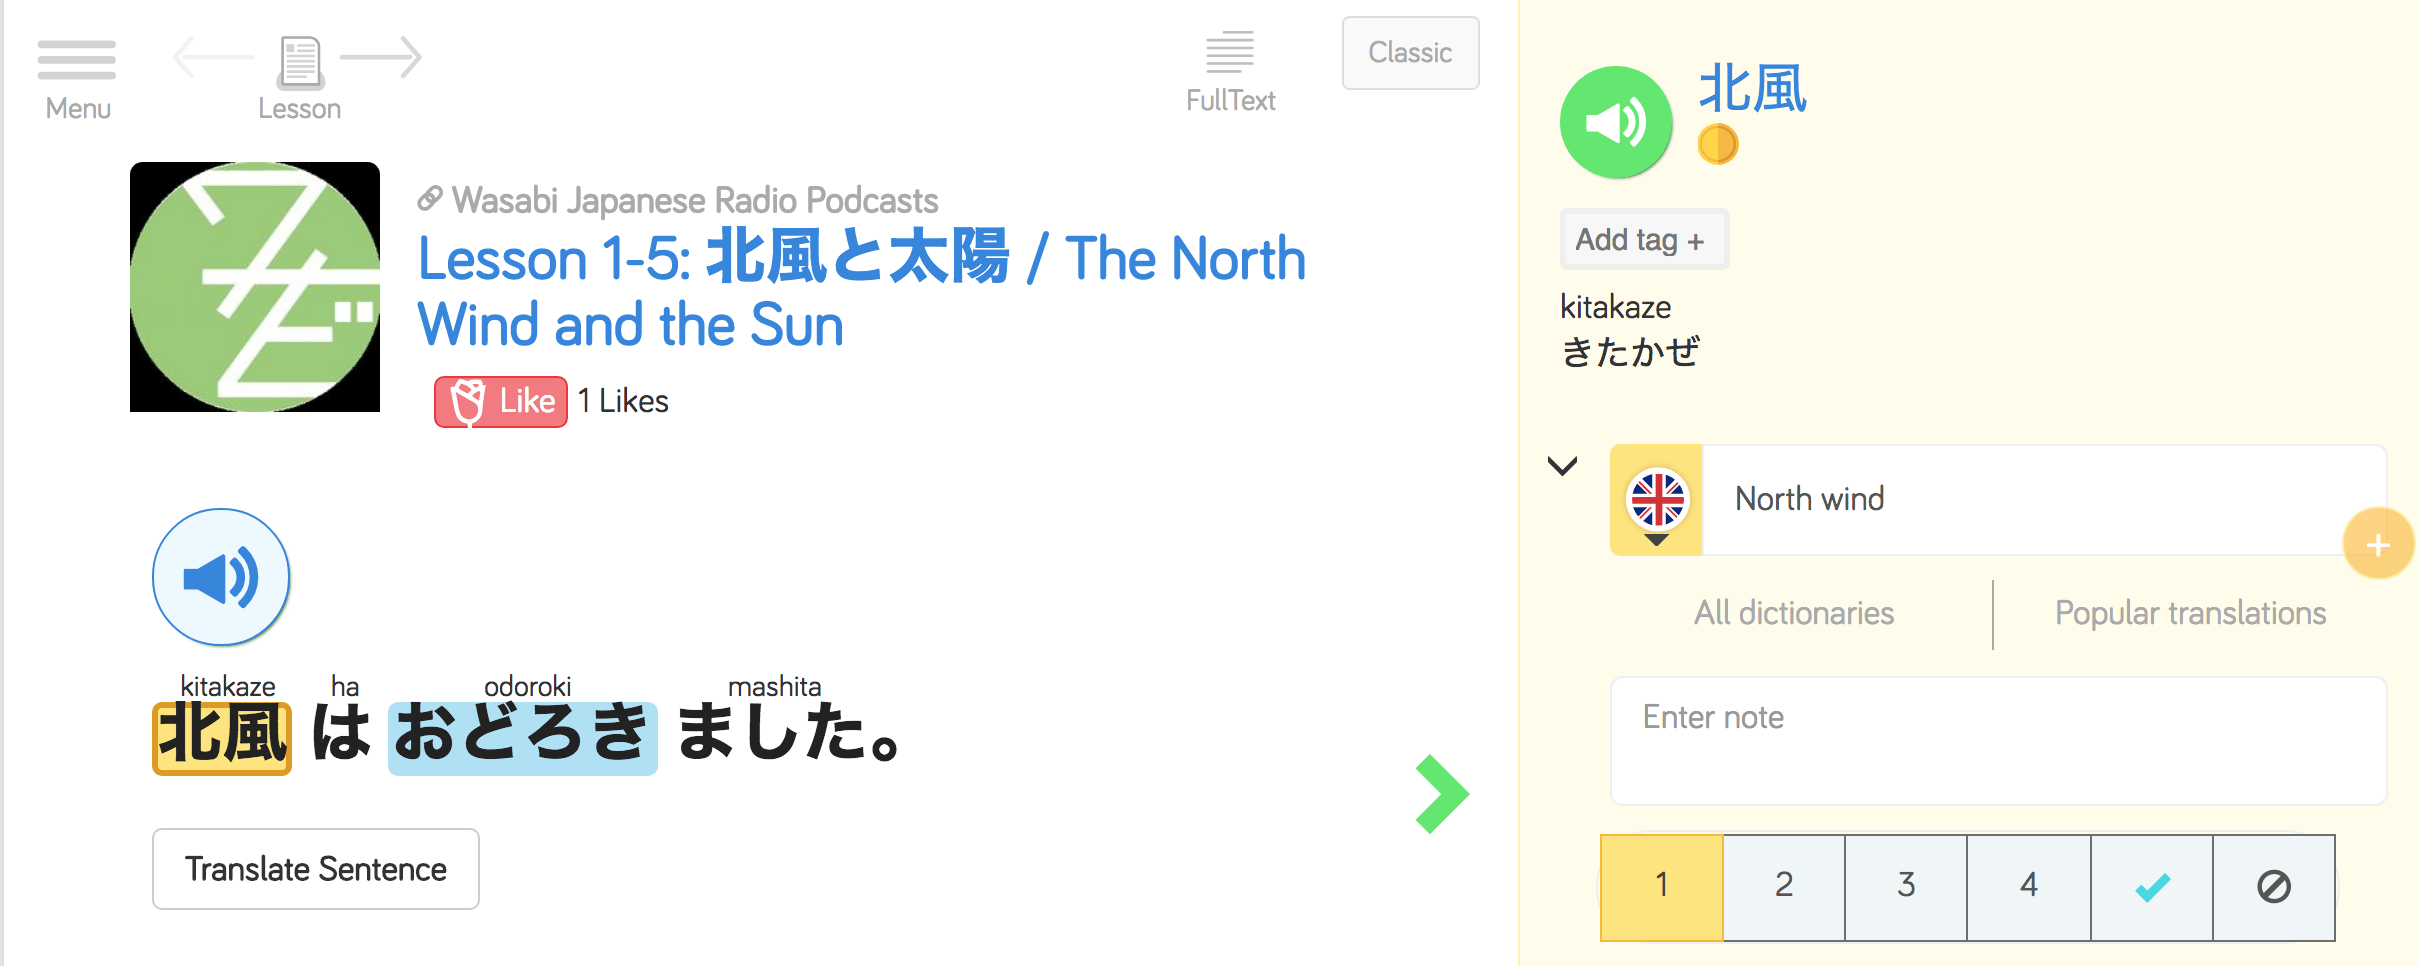 Japanese Onomatopoeia: A Guide